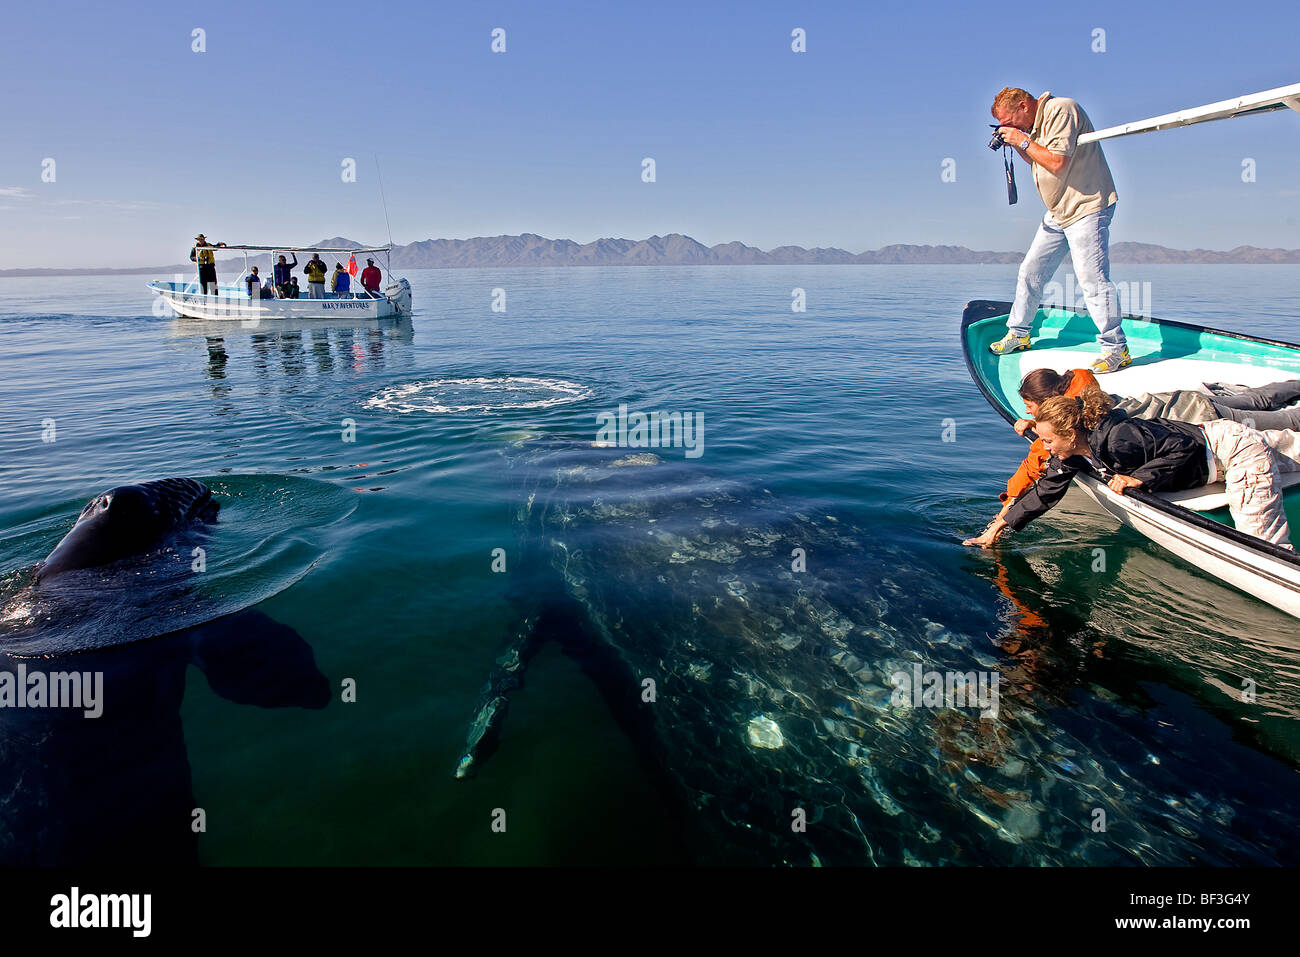 Gray Whale, Grey Whale (Eschrichtius robustus, Eschrichtius gibbosus), whale-watchers patting whale. - Stock Image